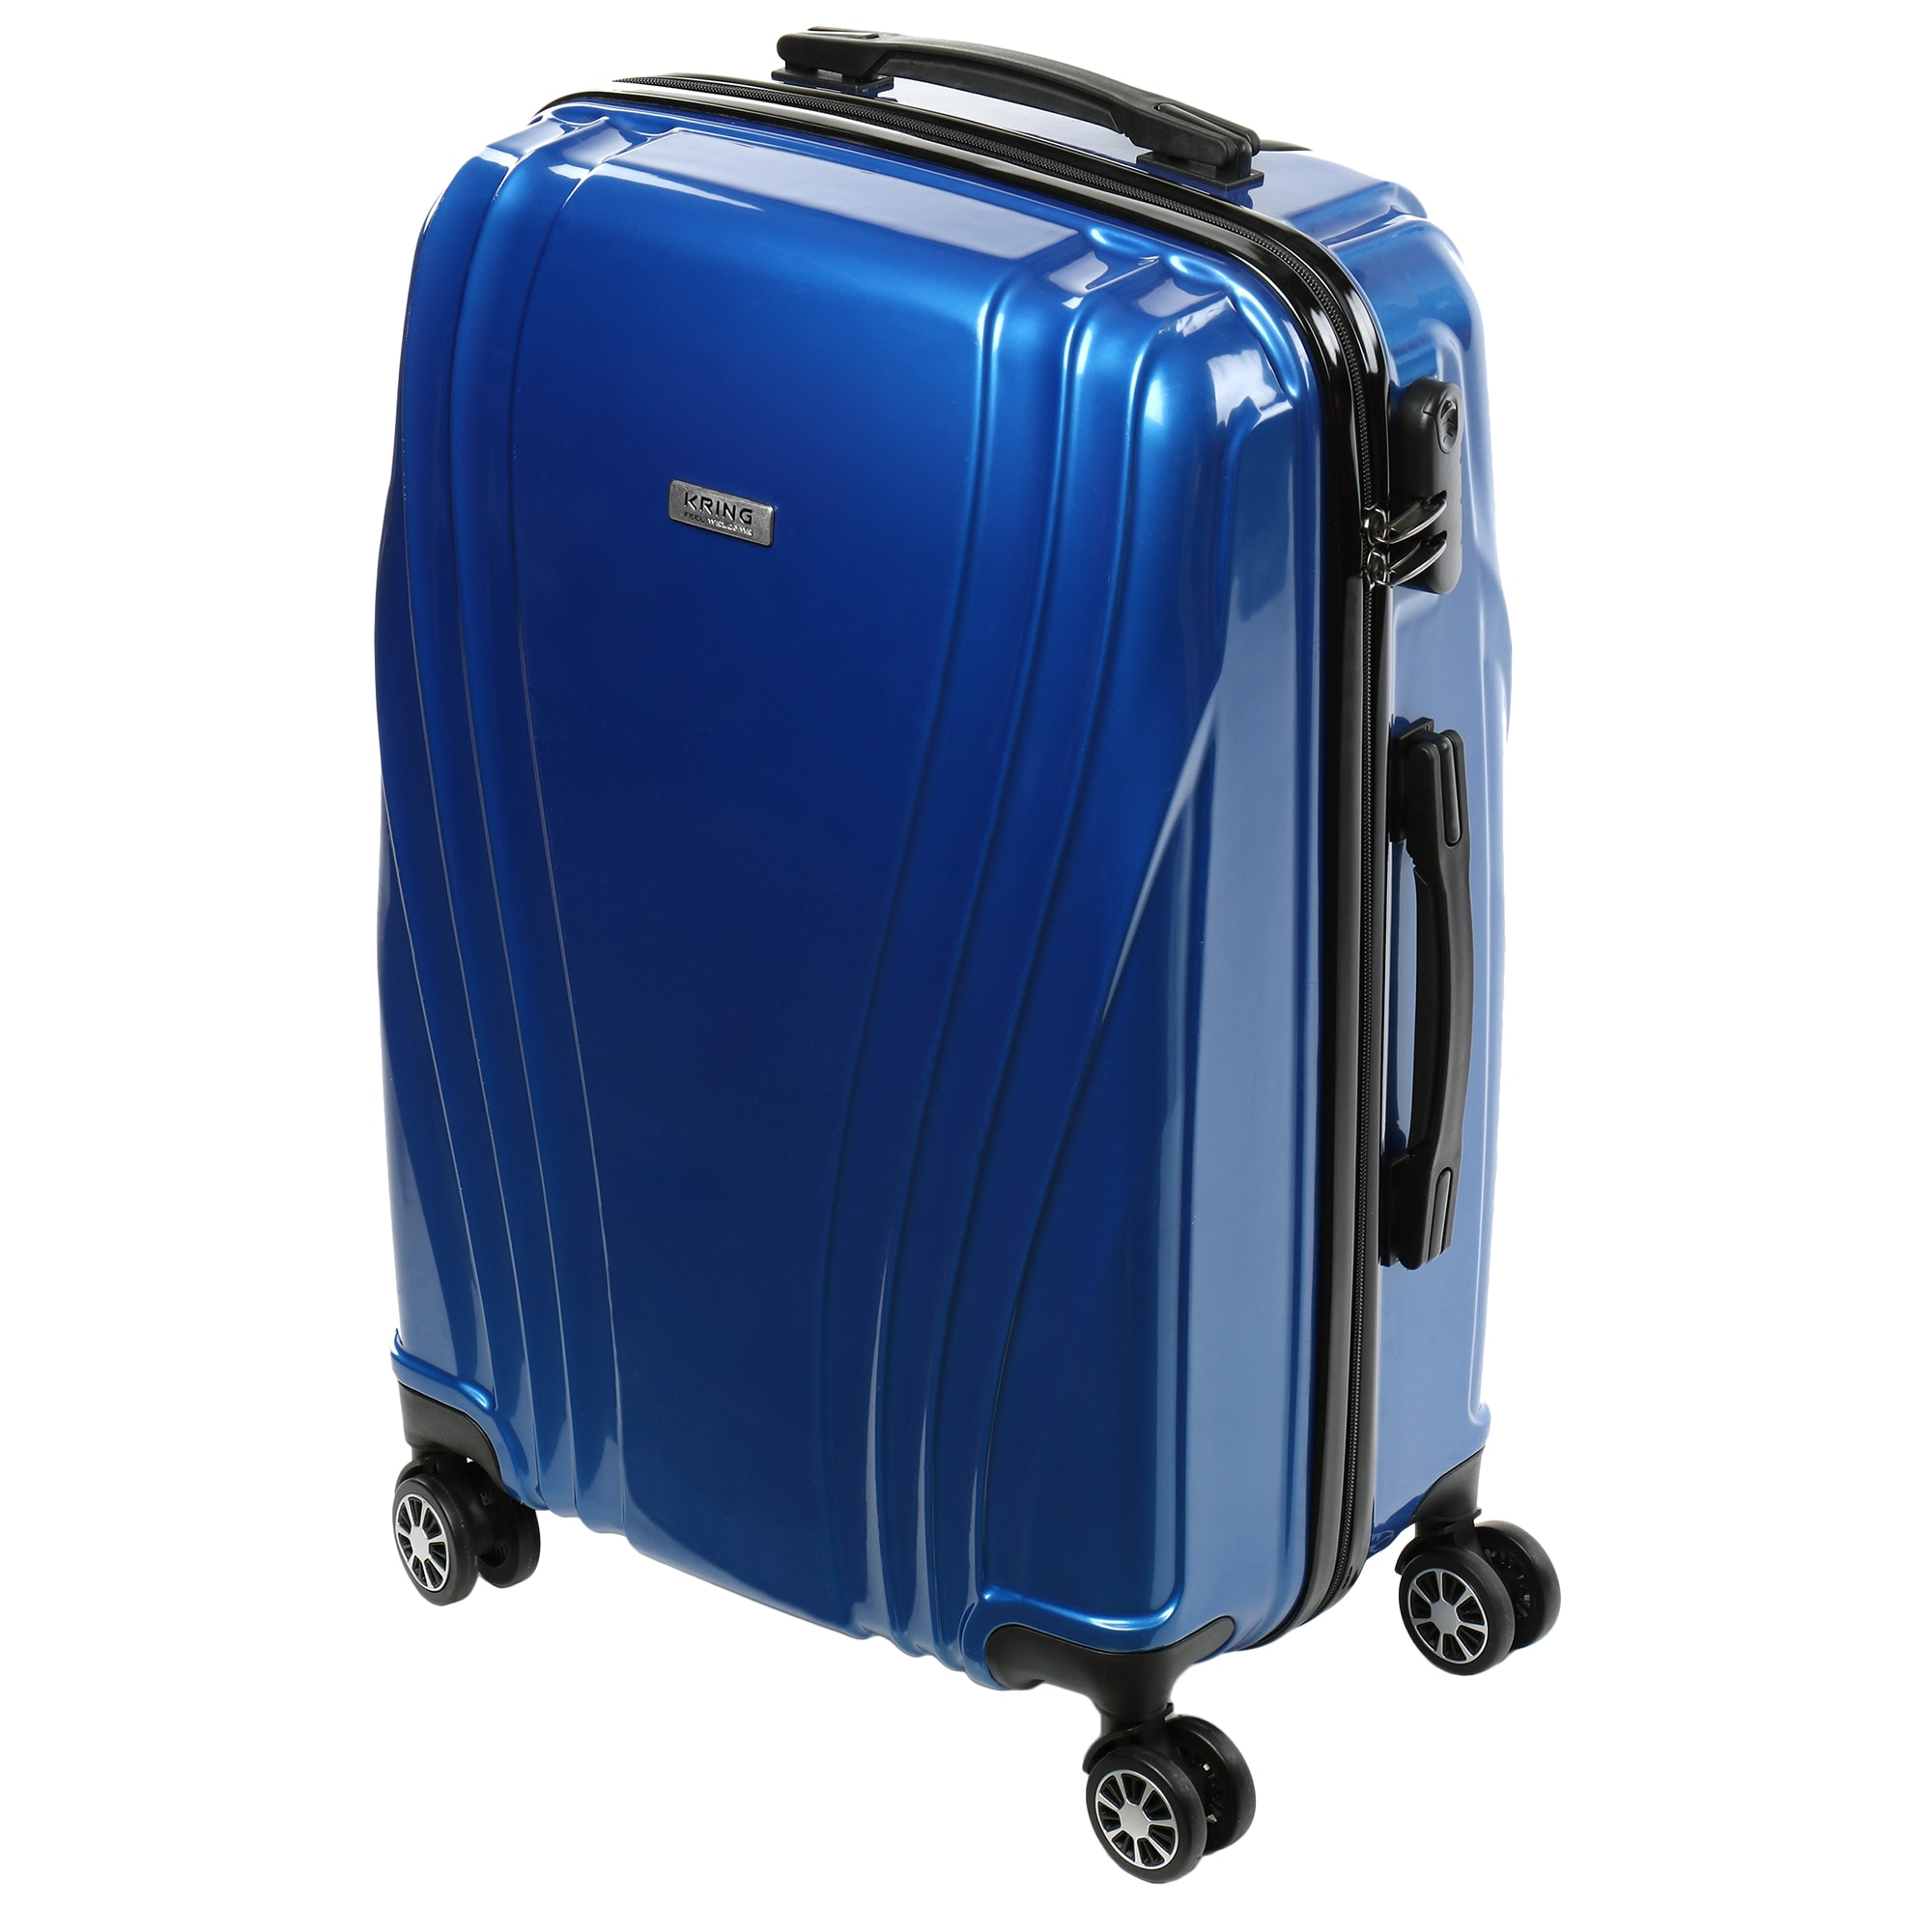 Fotografie Troler Kring JetSet, ABS+PC 75 cm, Blue